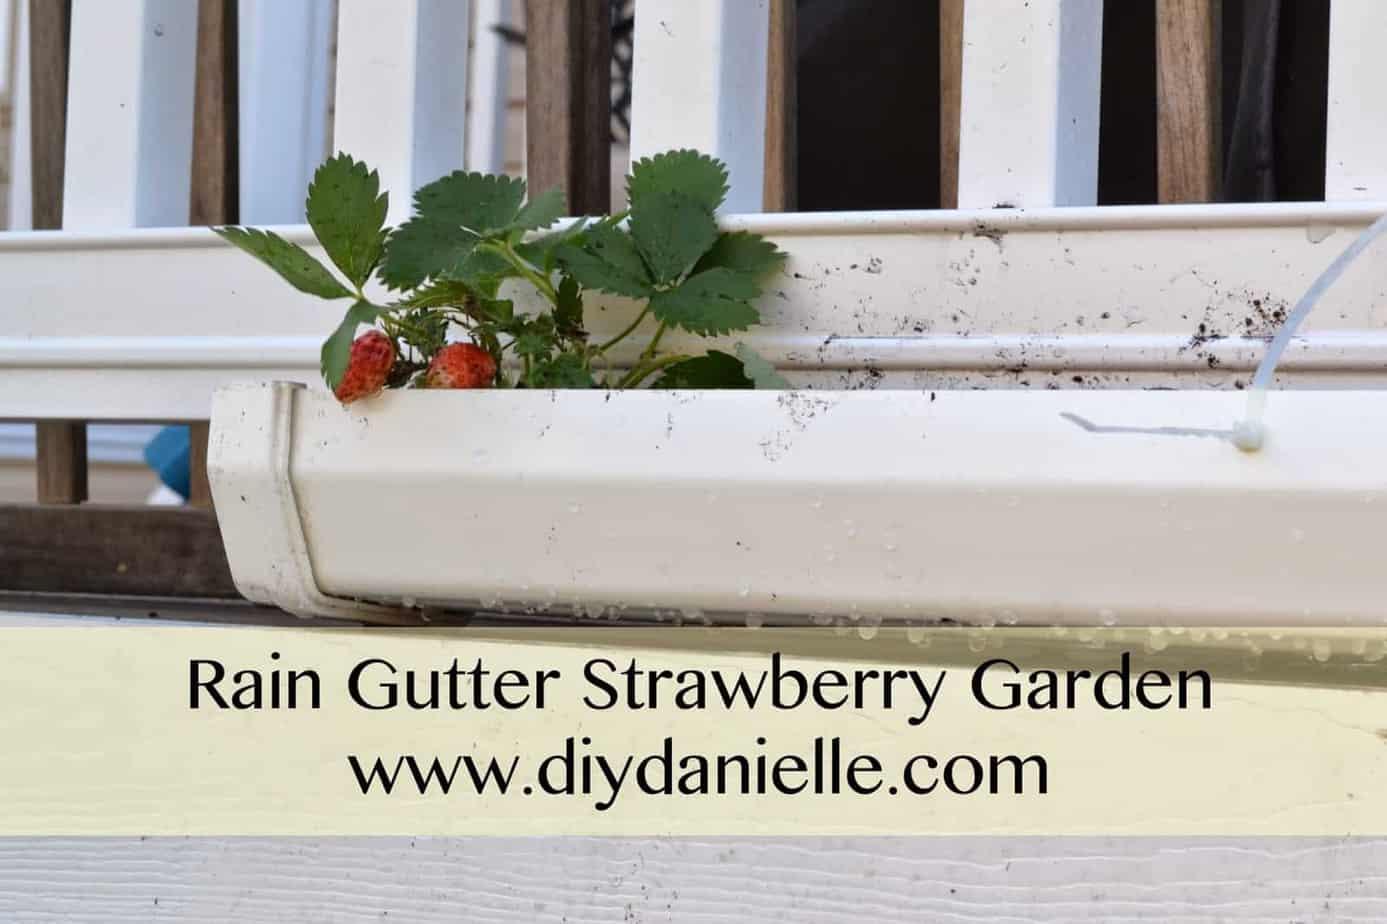 Strawberries In The Gutters Diy Danielle